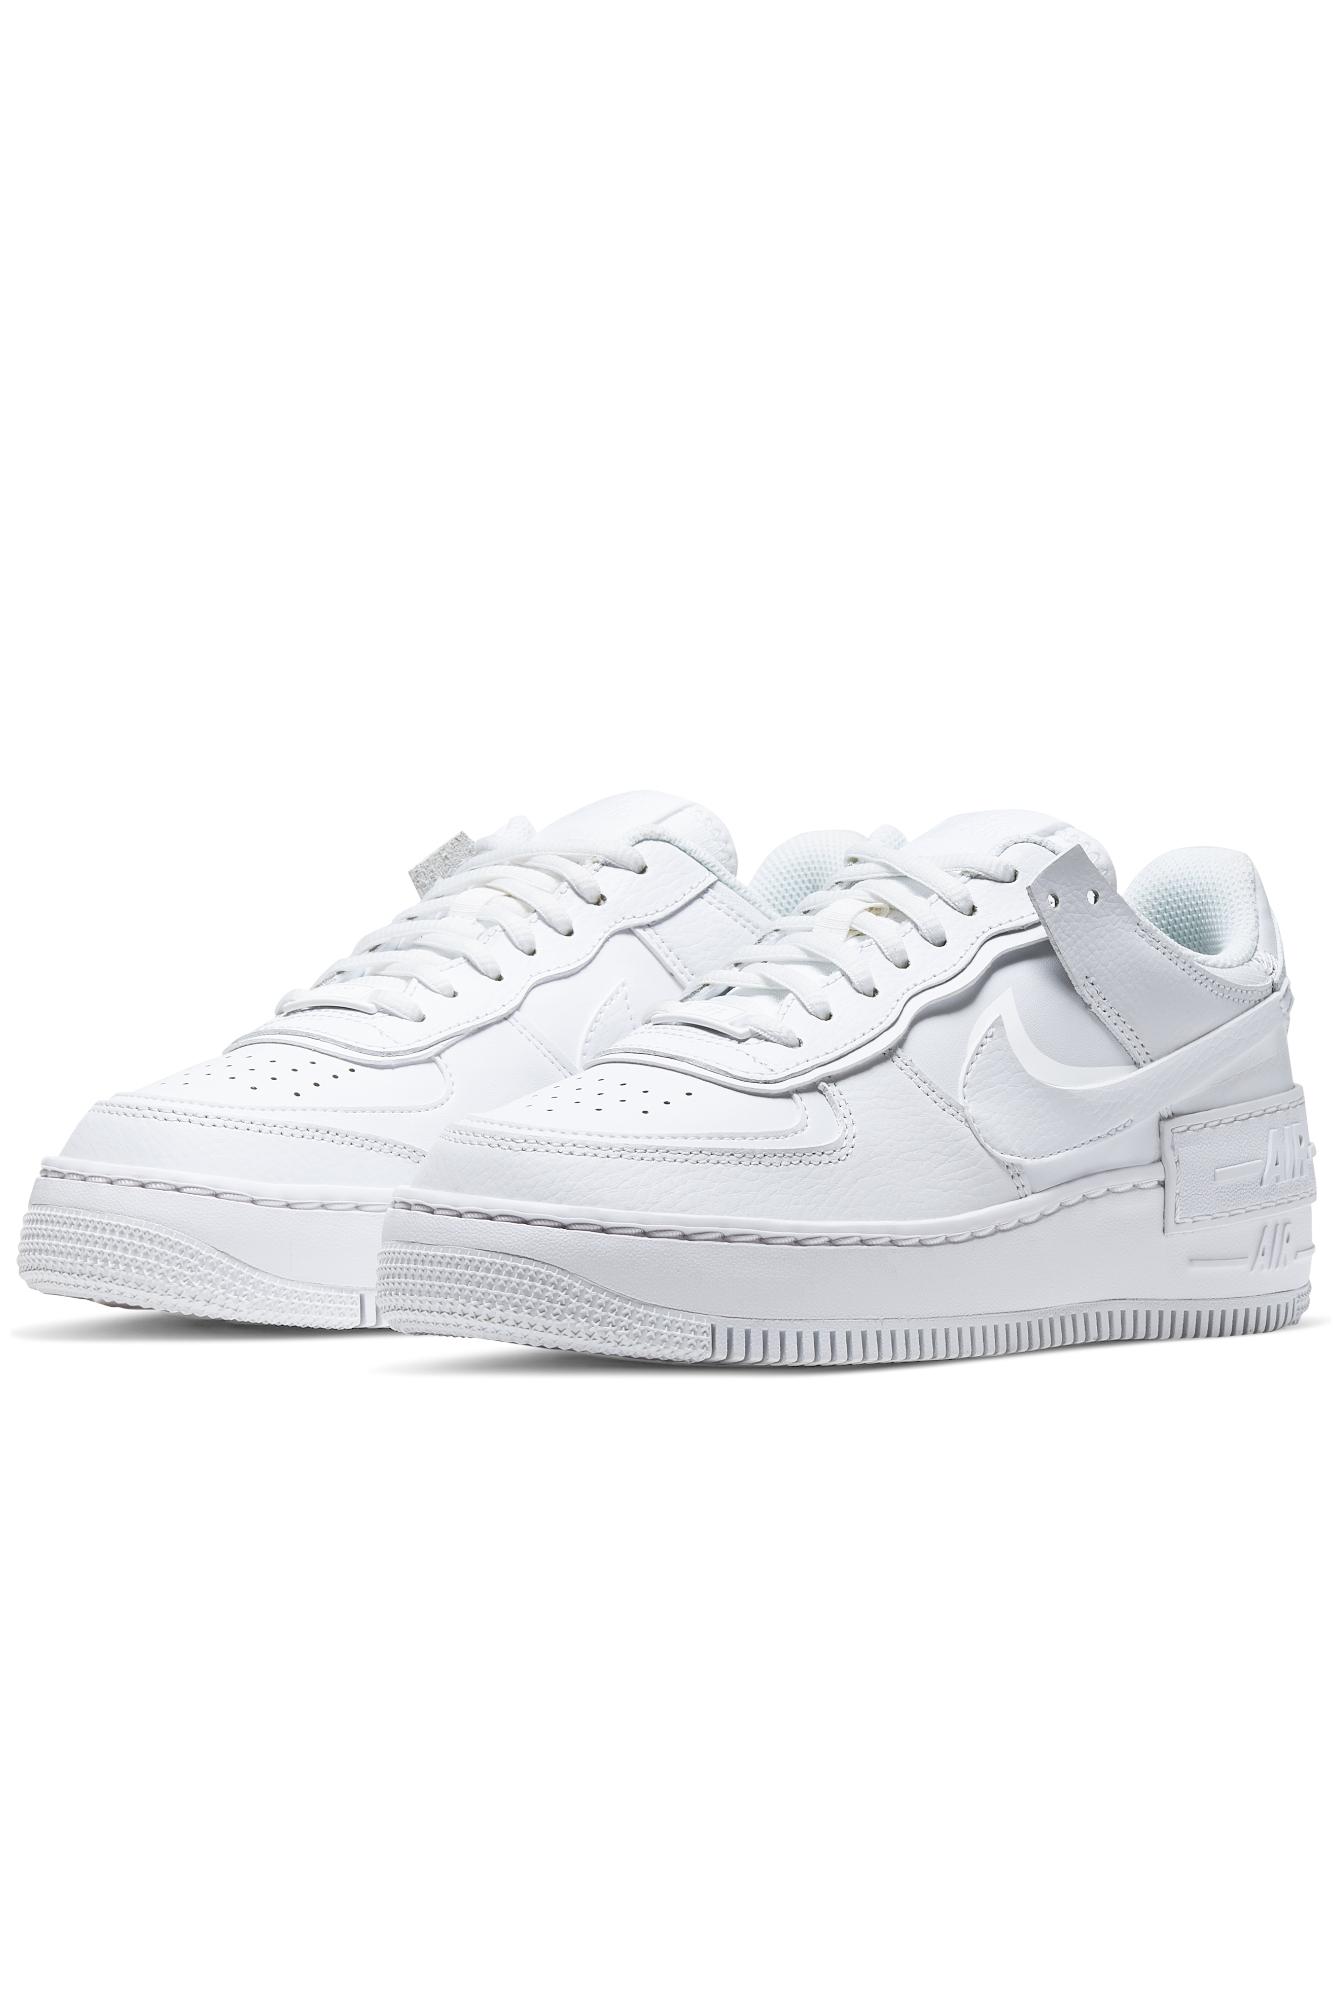 Nike Sportswear Air Force 1 Shadow WhiteWhite | CI0919 100